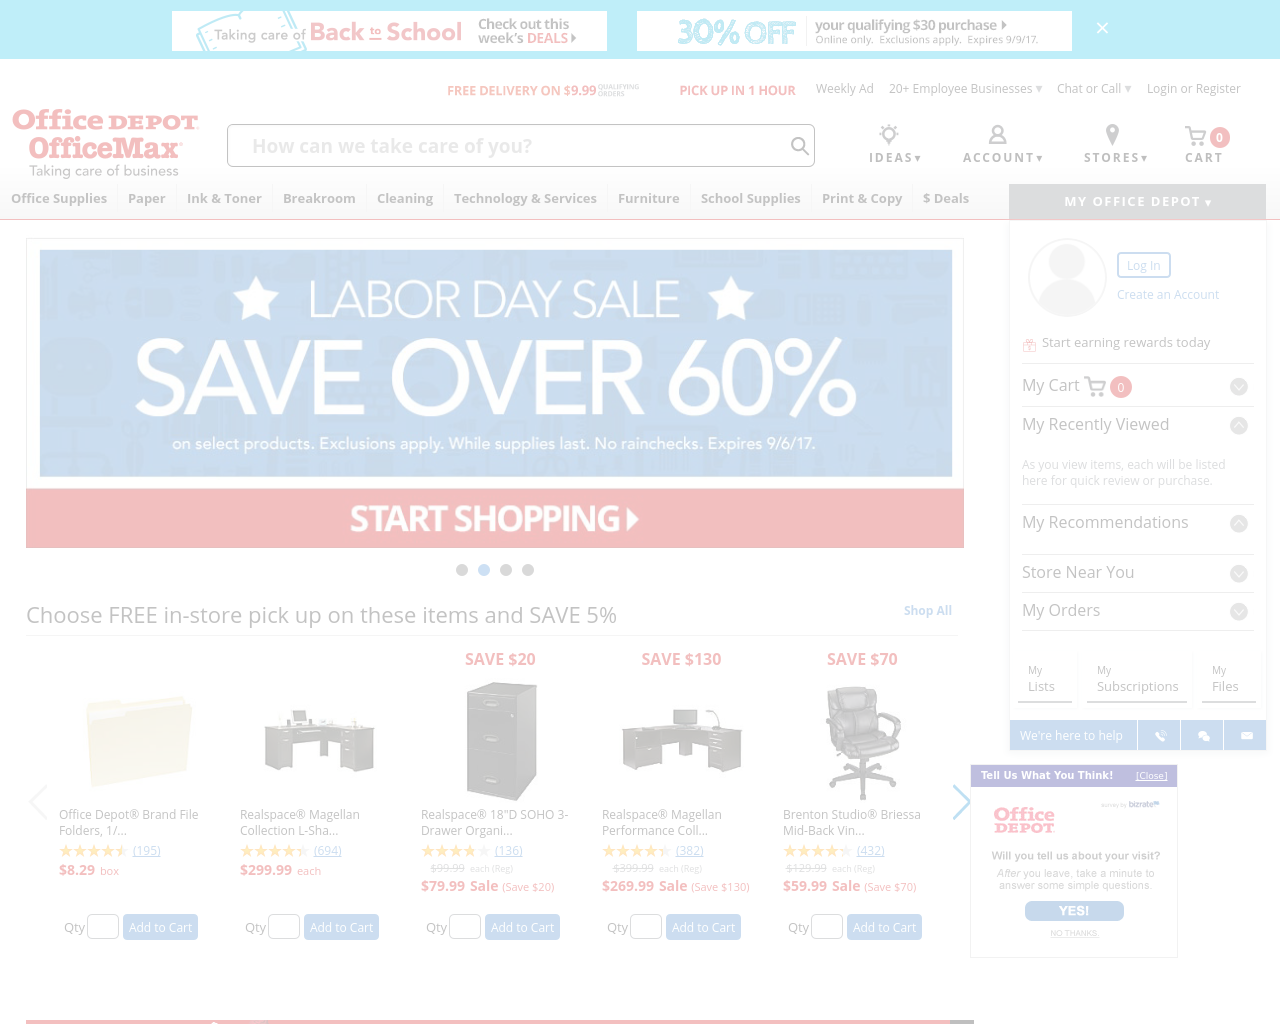 Windows-Phone-Daily-Advertising-Reviews-Pricing